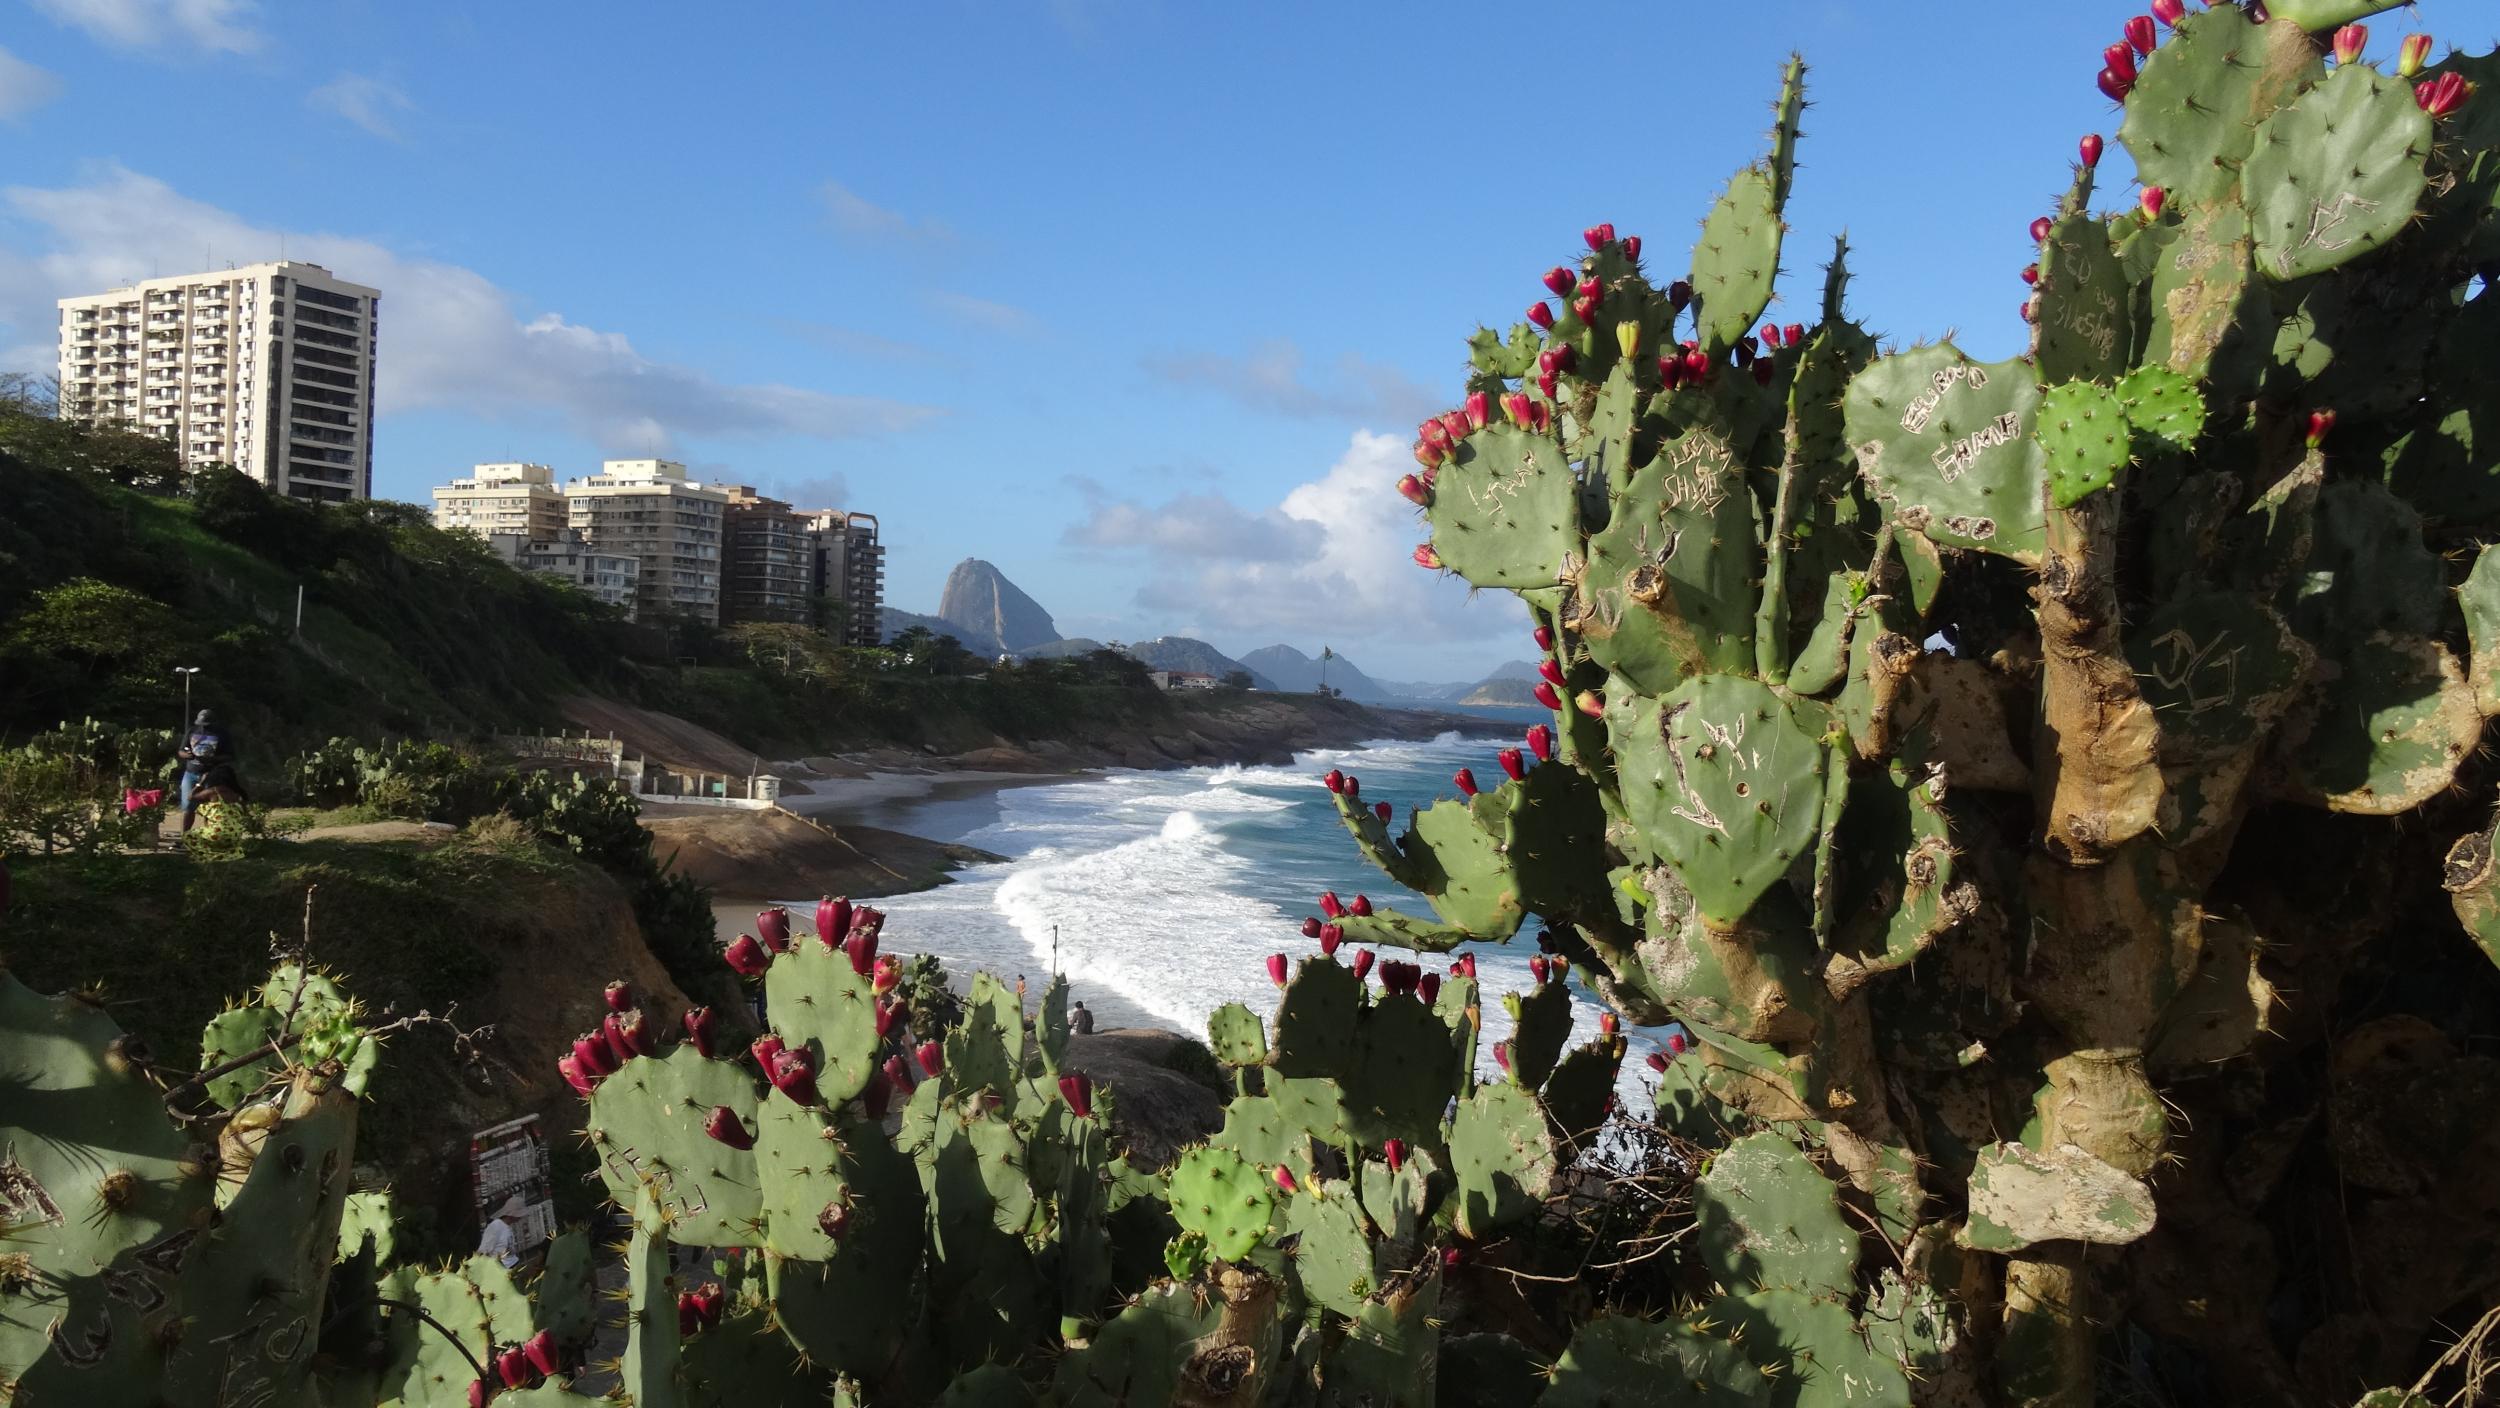 13. View between beaches